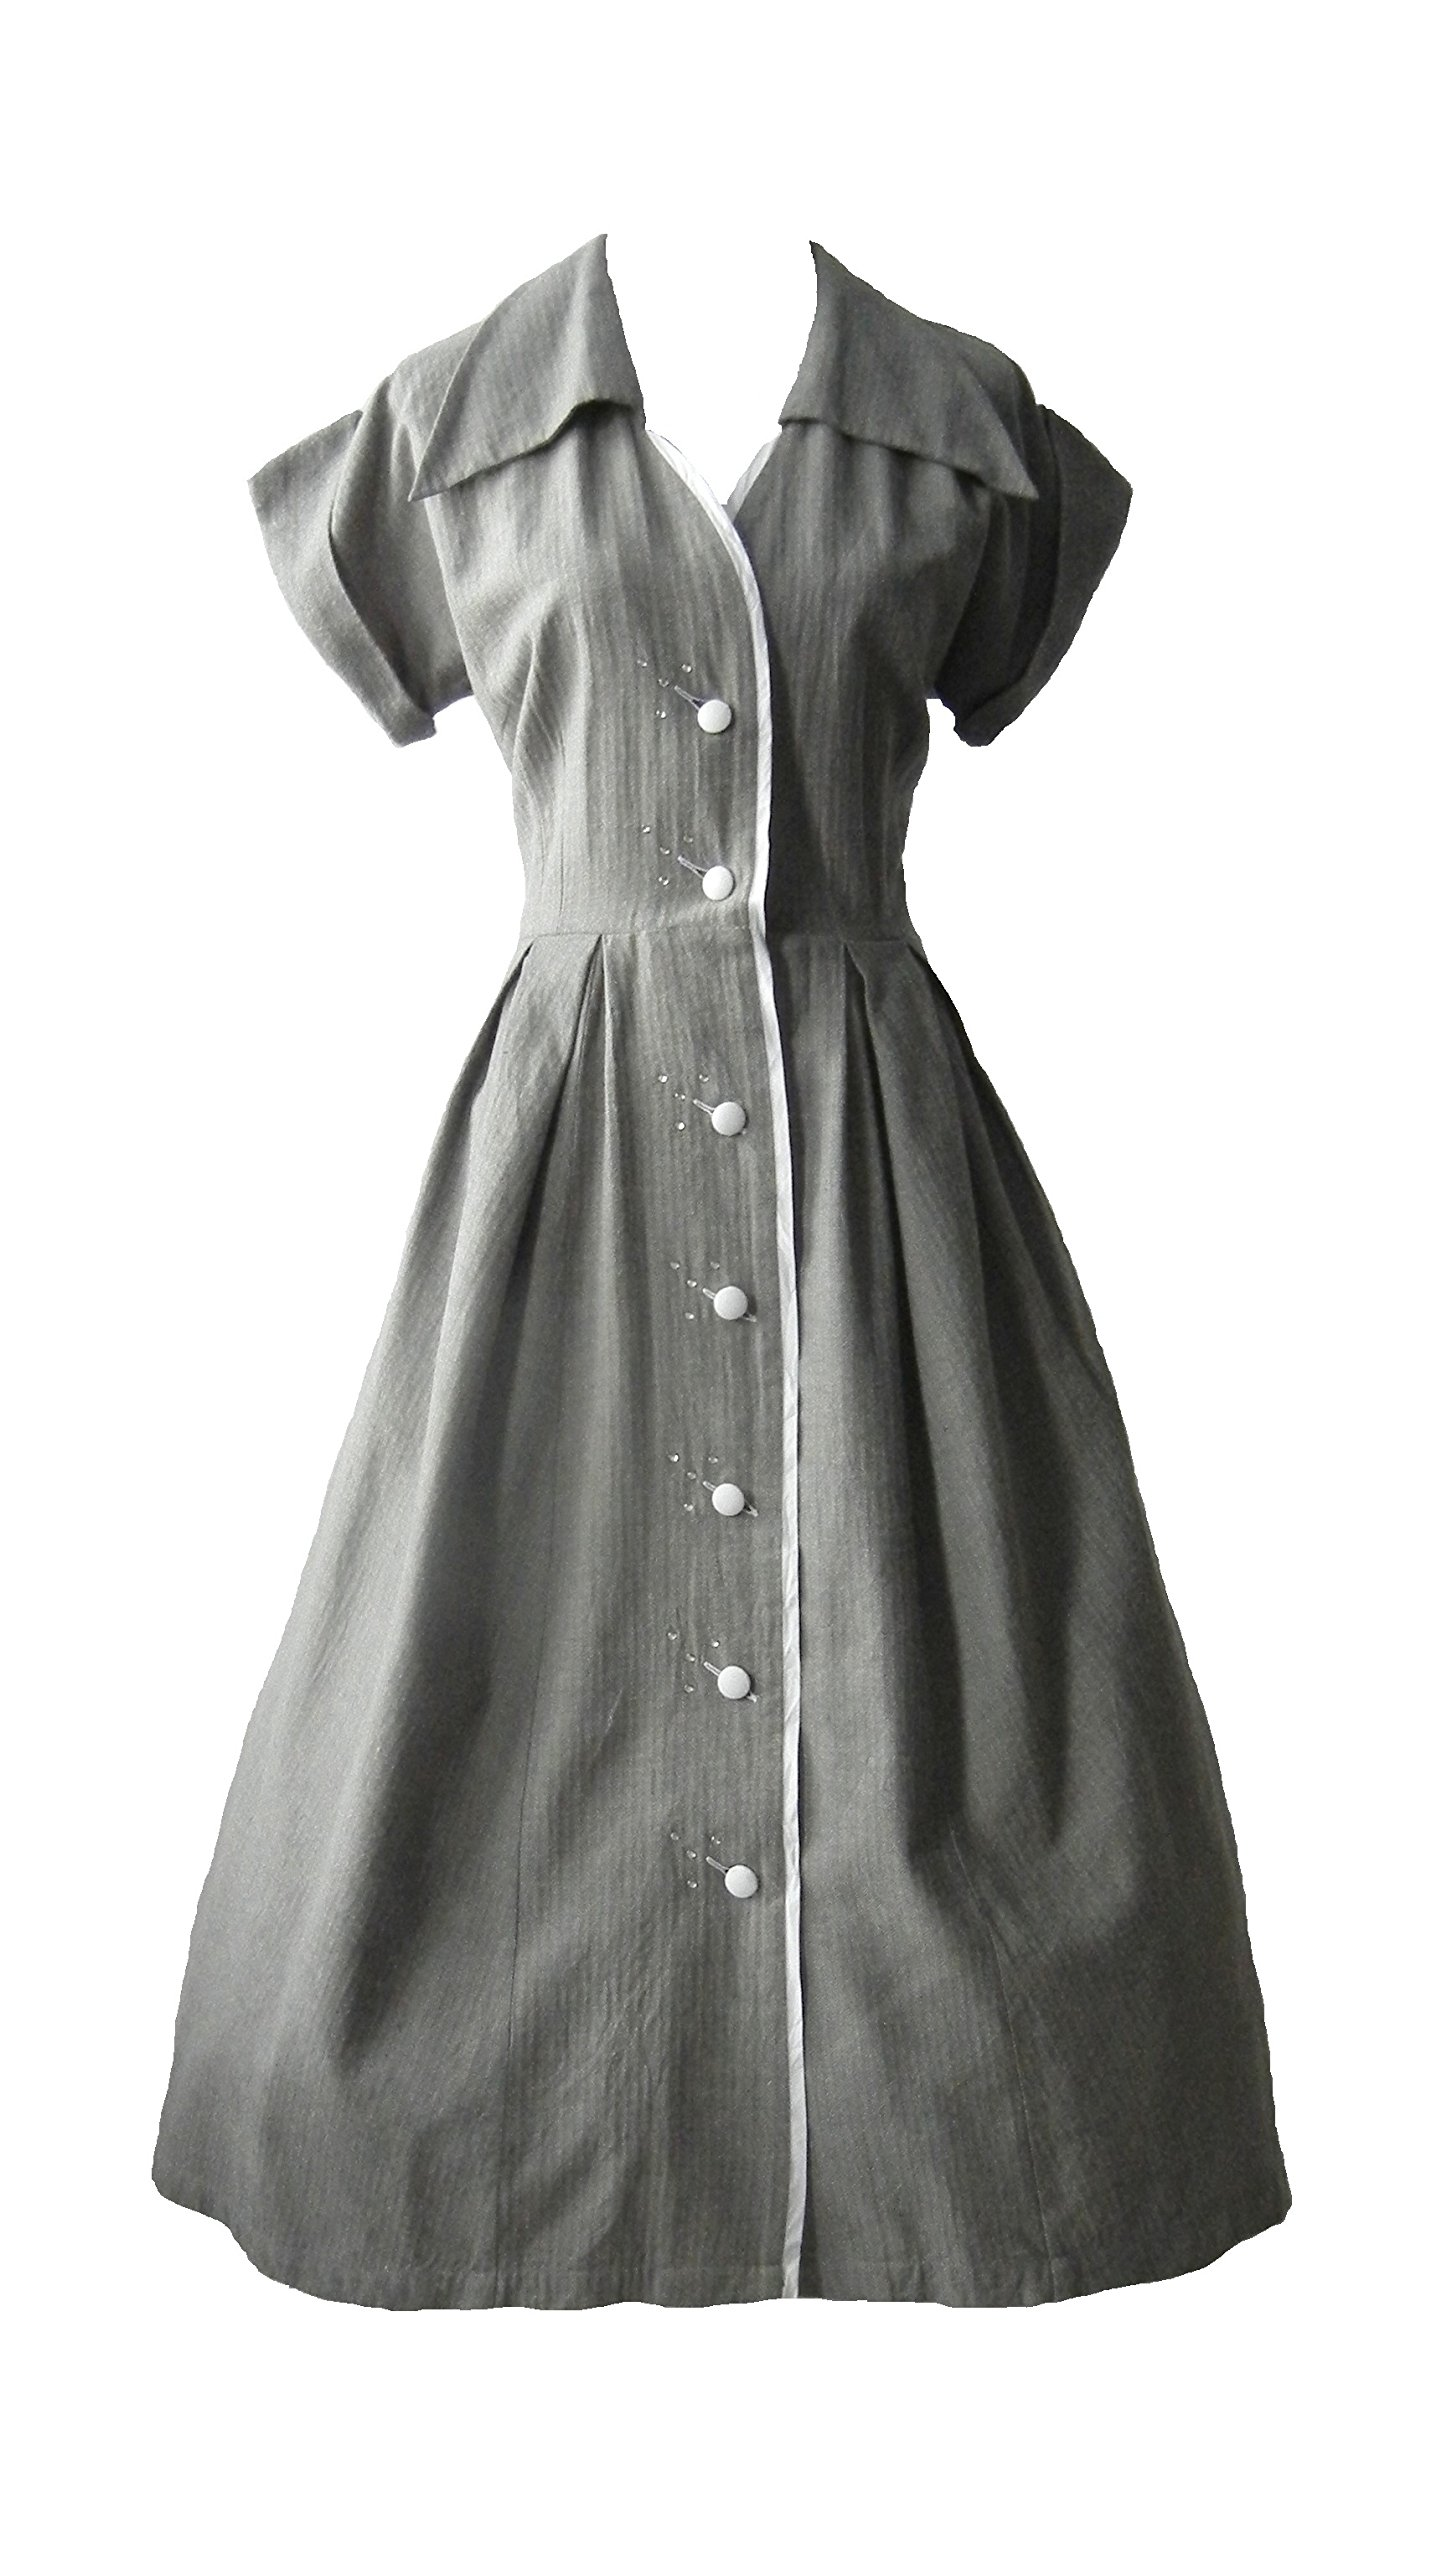 1950s Vintage Style Pin Up Rockabilly Shirt Waist Dress